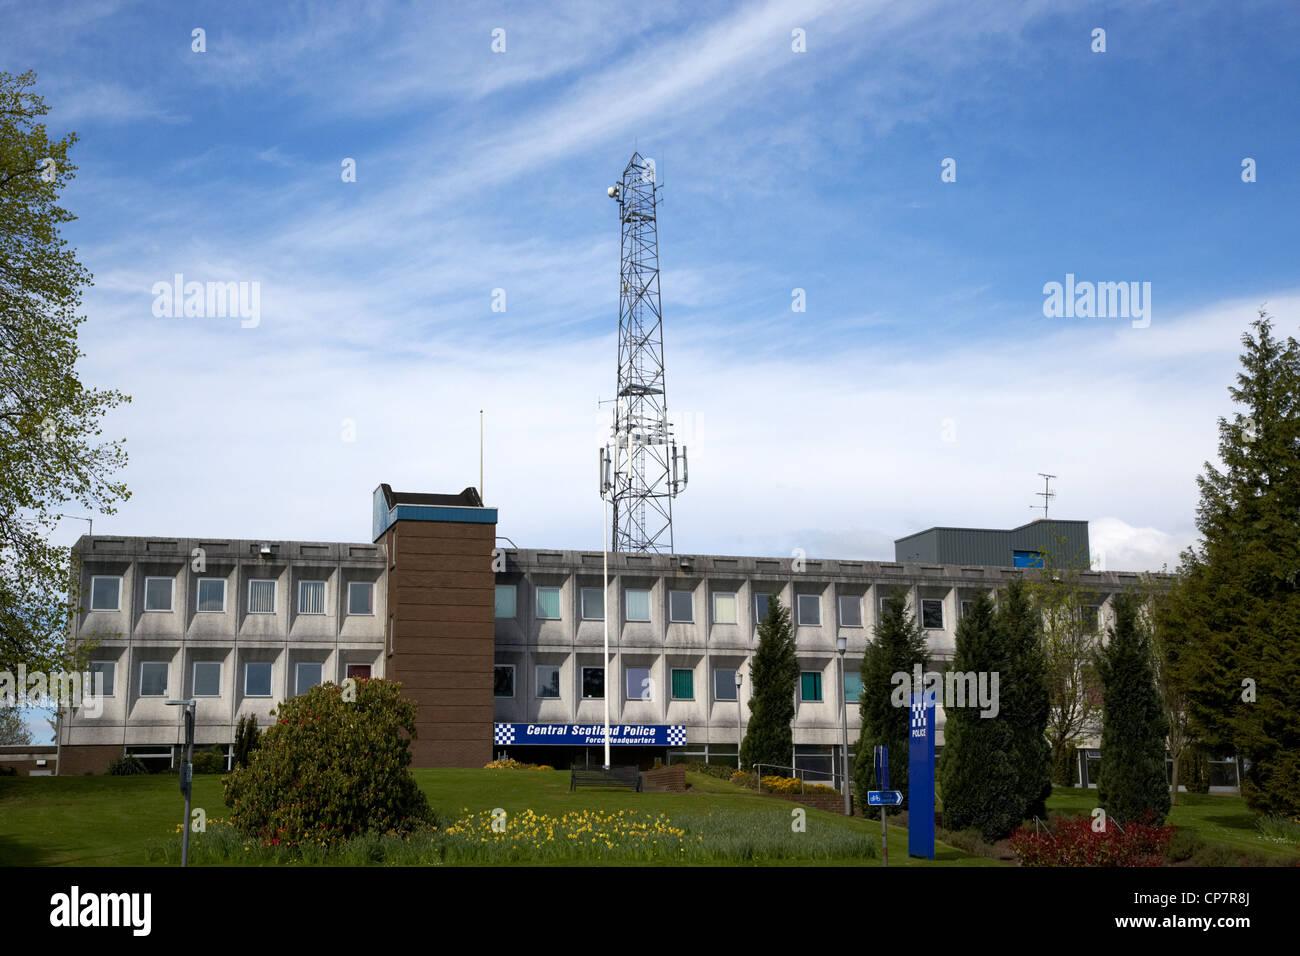 central scotland police force headquarters stirling Scotland UK - Stock Image